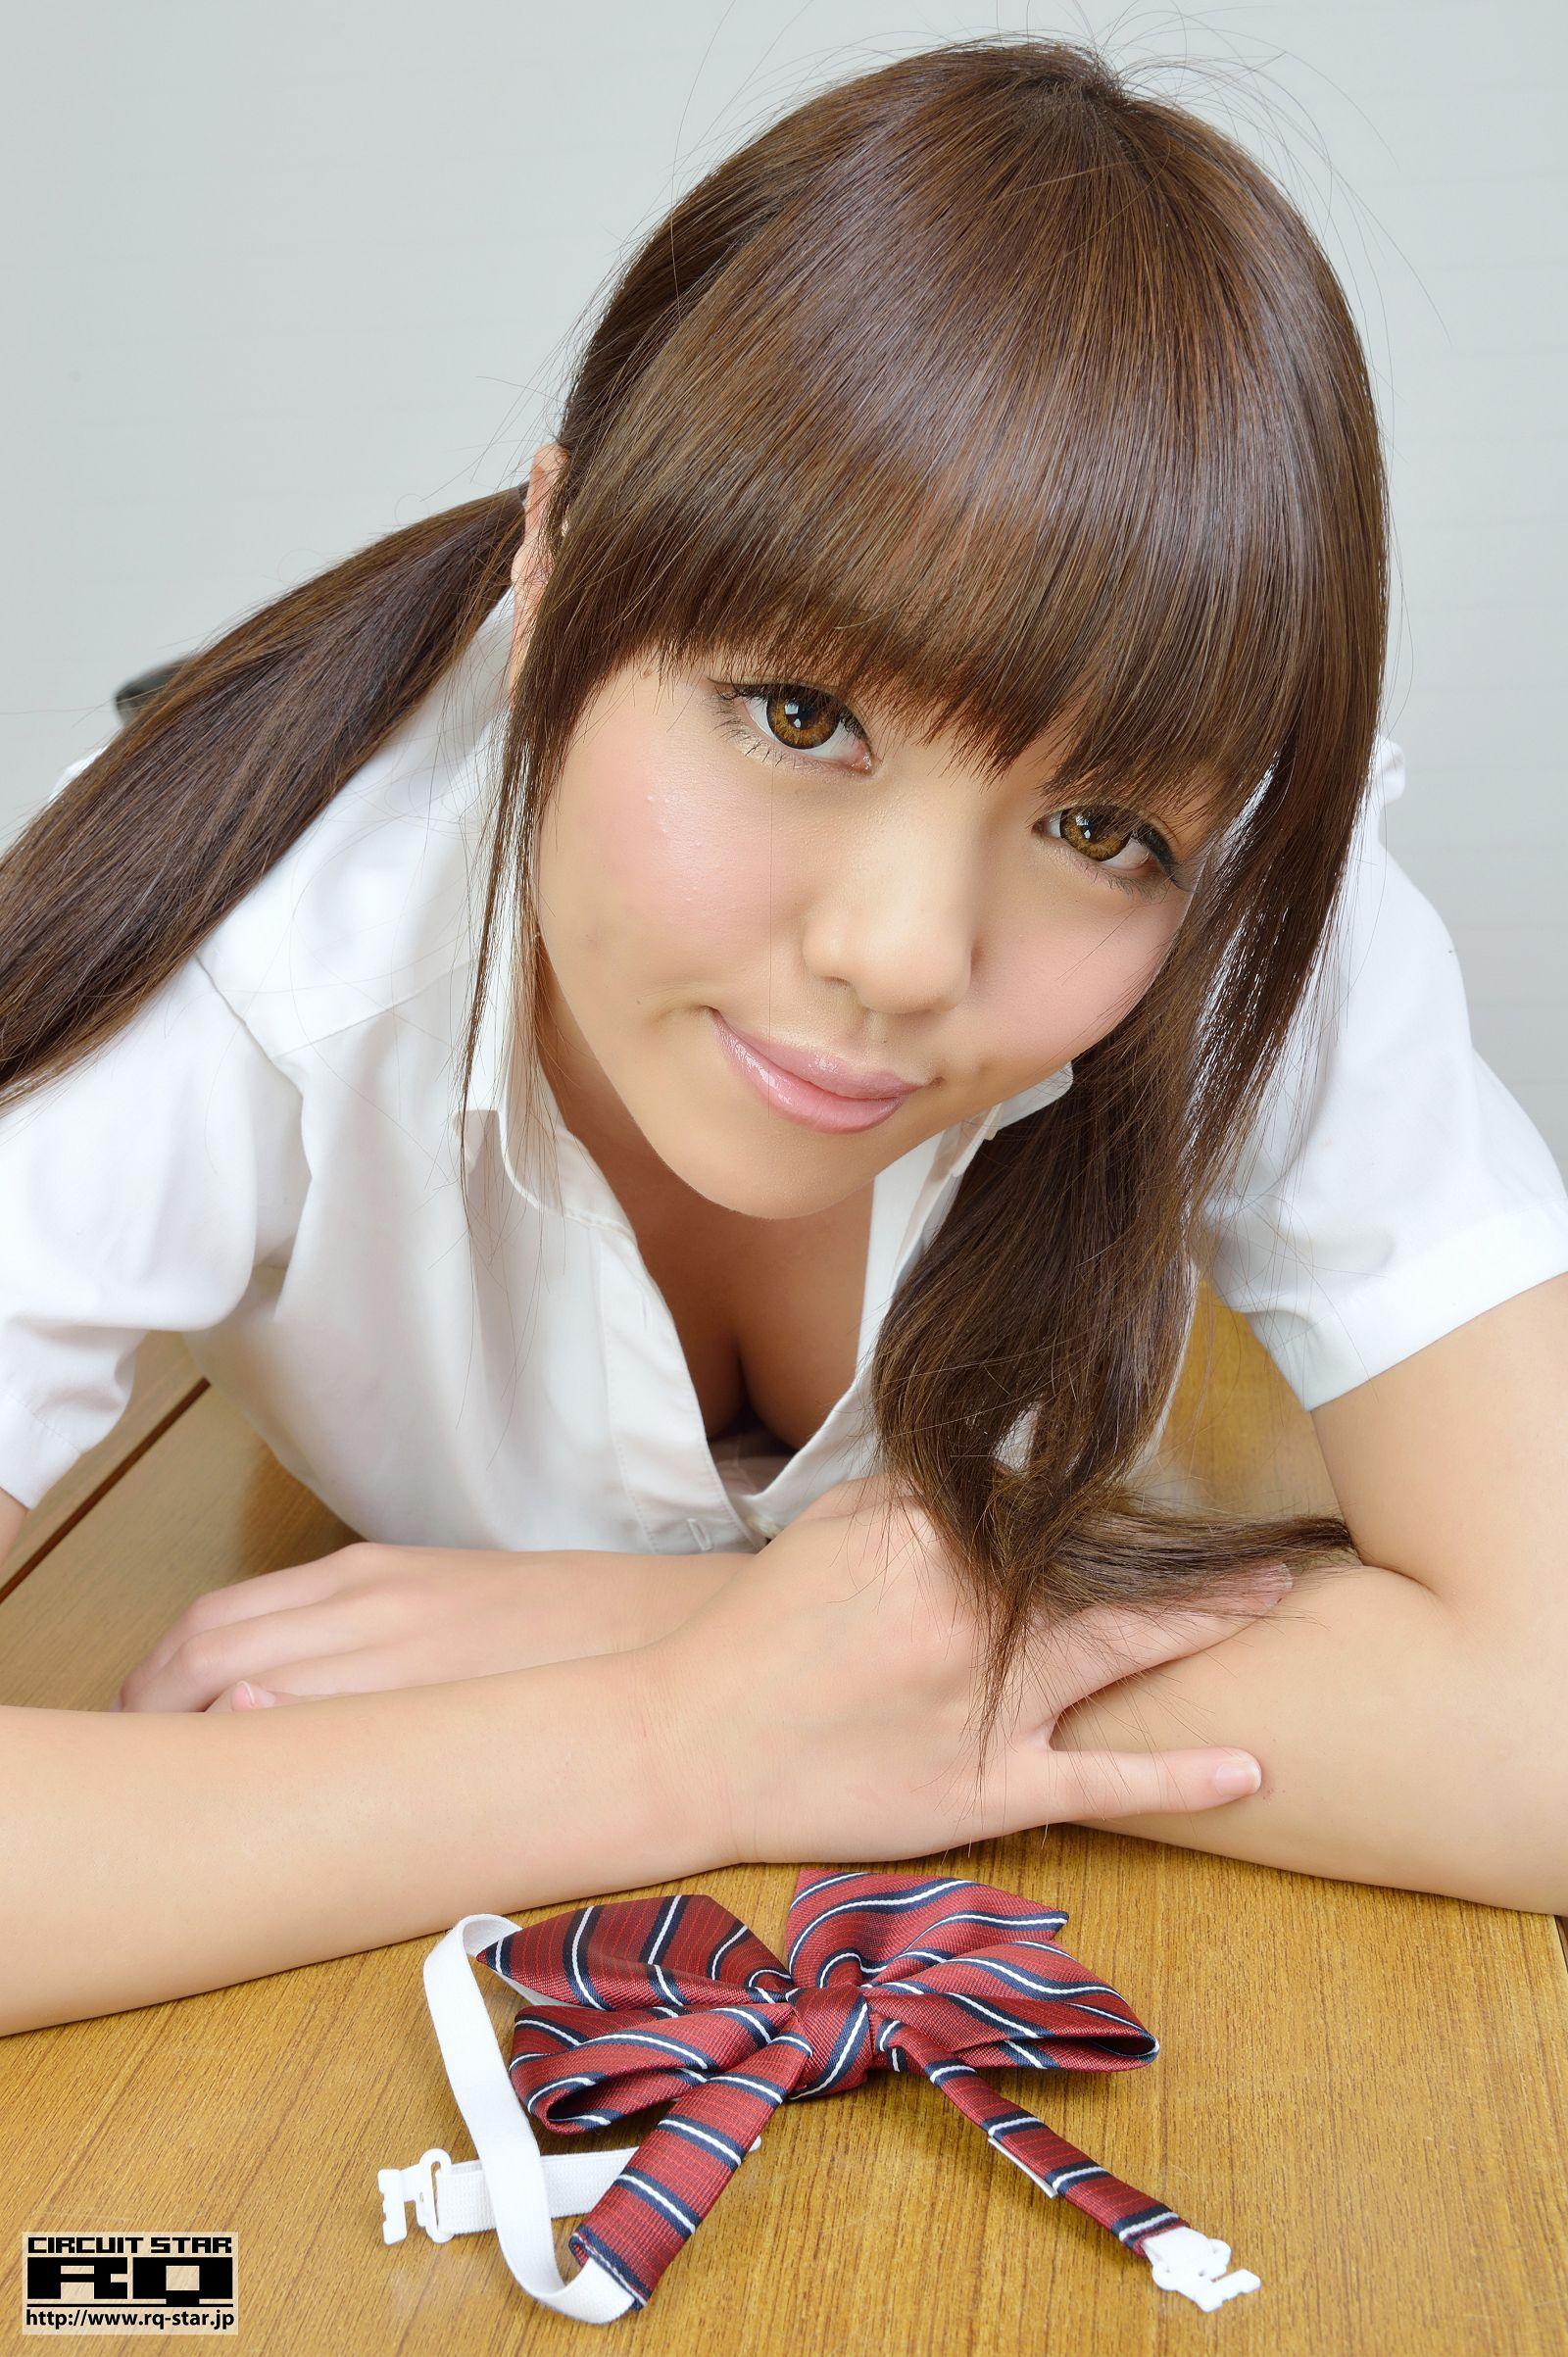 [RQ STAR美女] NO.00726 Natsuki Higurashi 日暮なつき School Girl Style[100P] RQ STAR 第3张